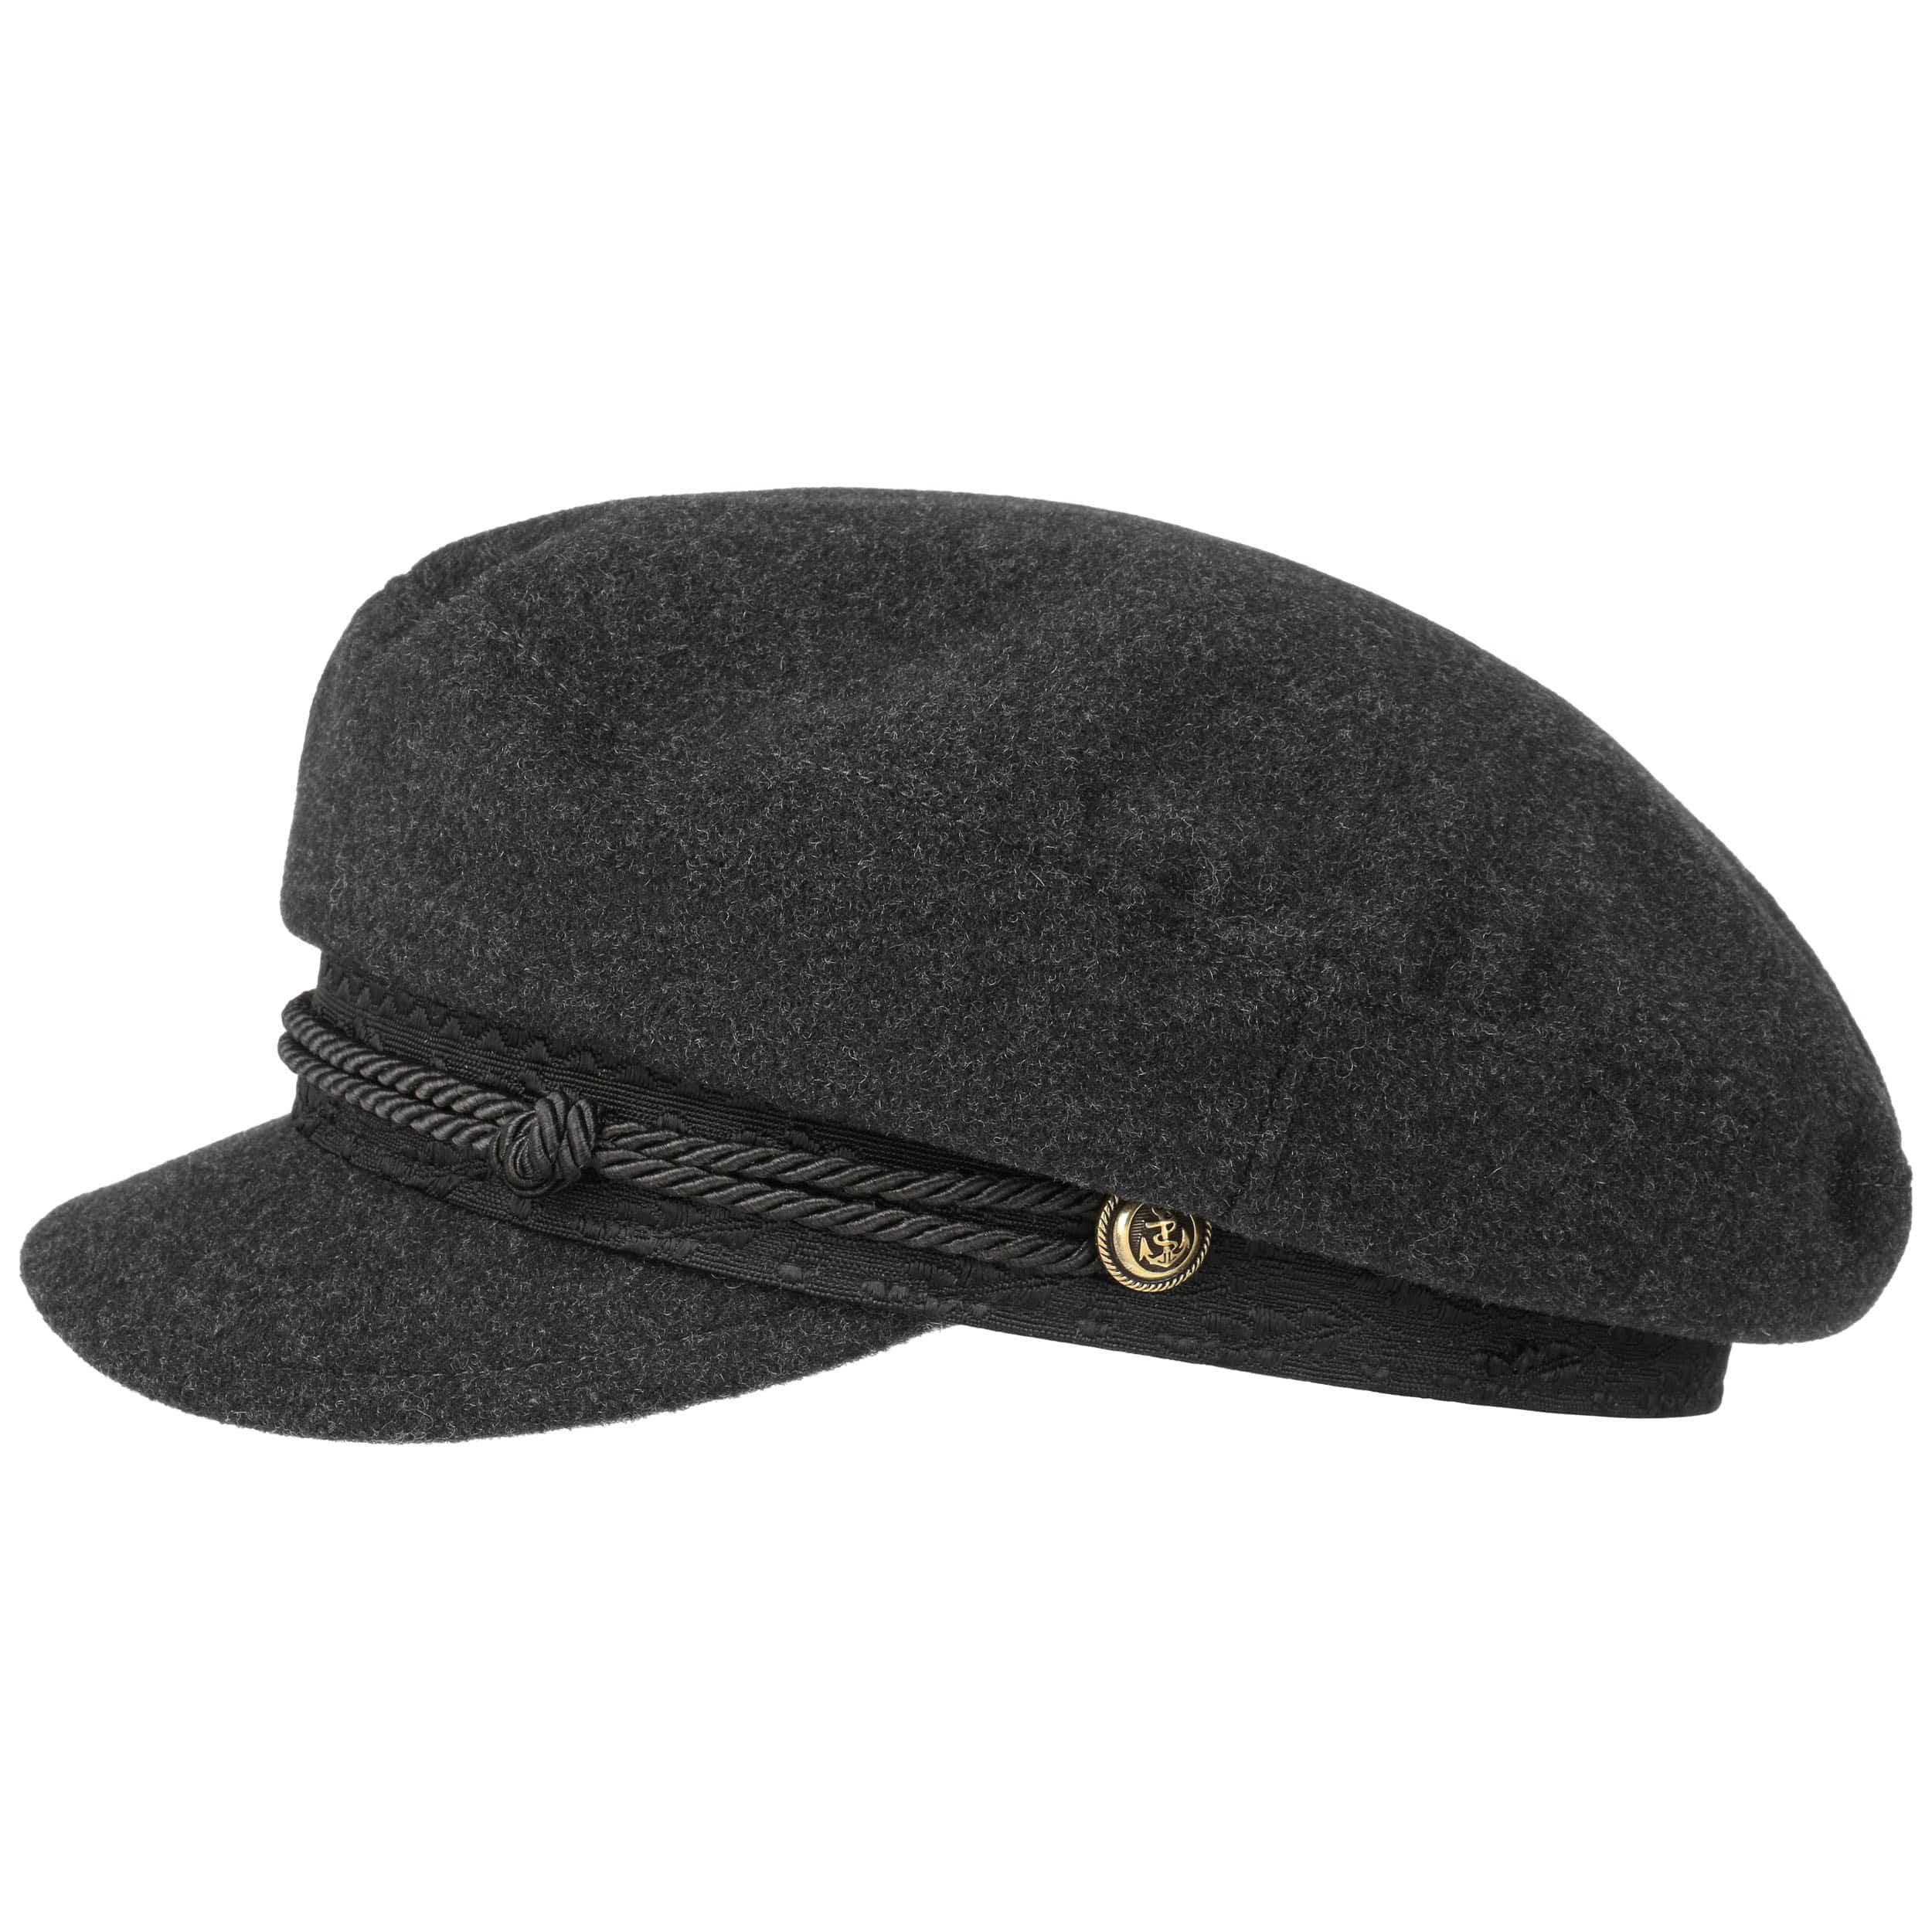 c662fc4e89e60 ... Wool Cashmere Riders Cap by Stetson - grey 6 ...